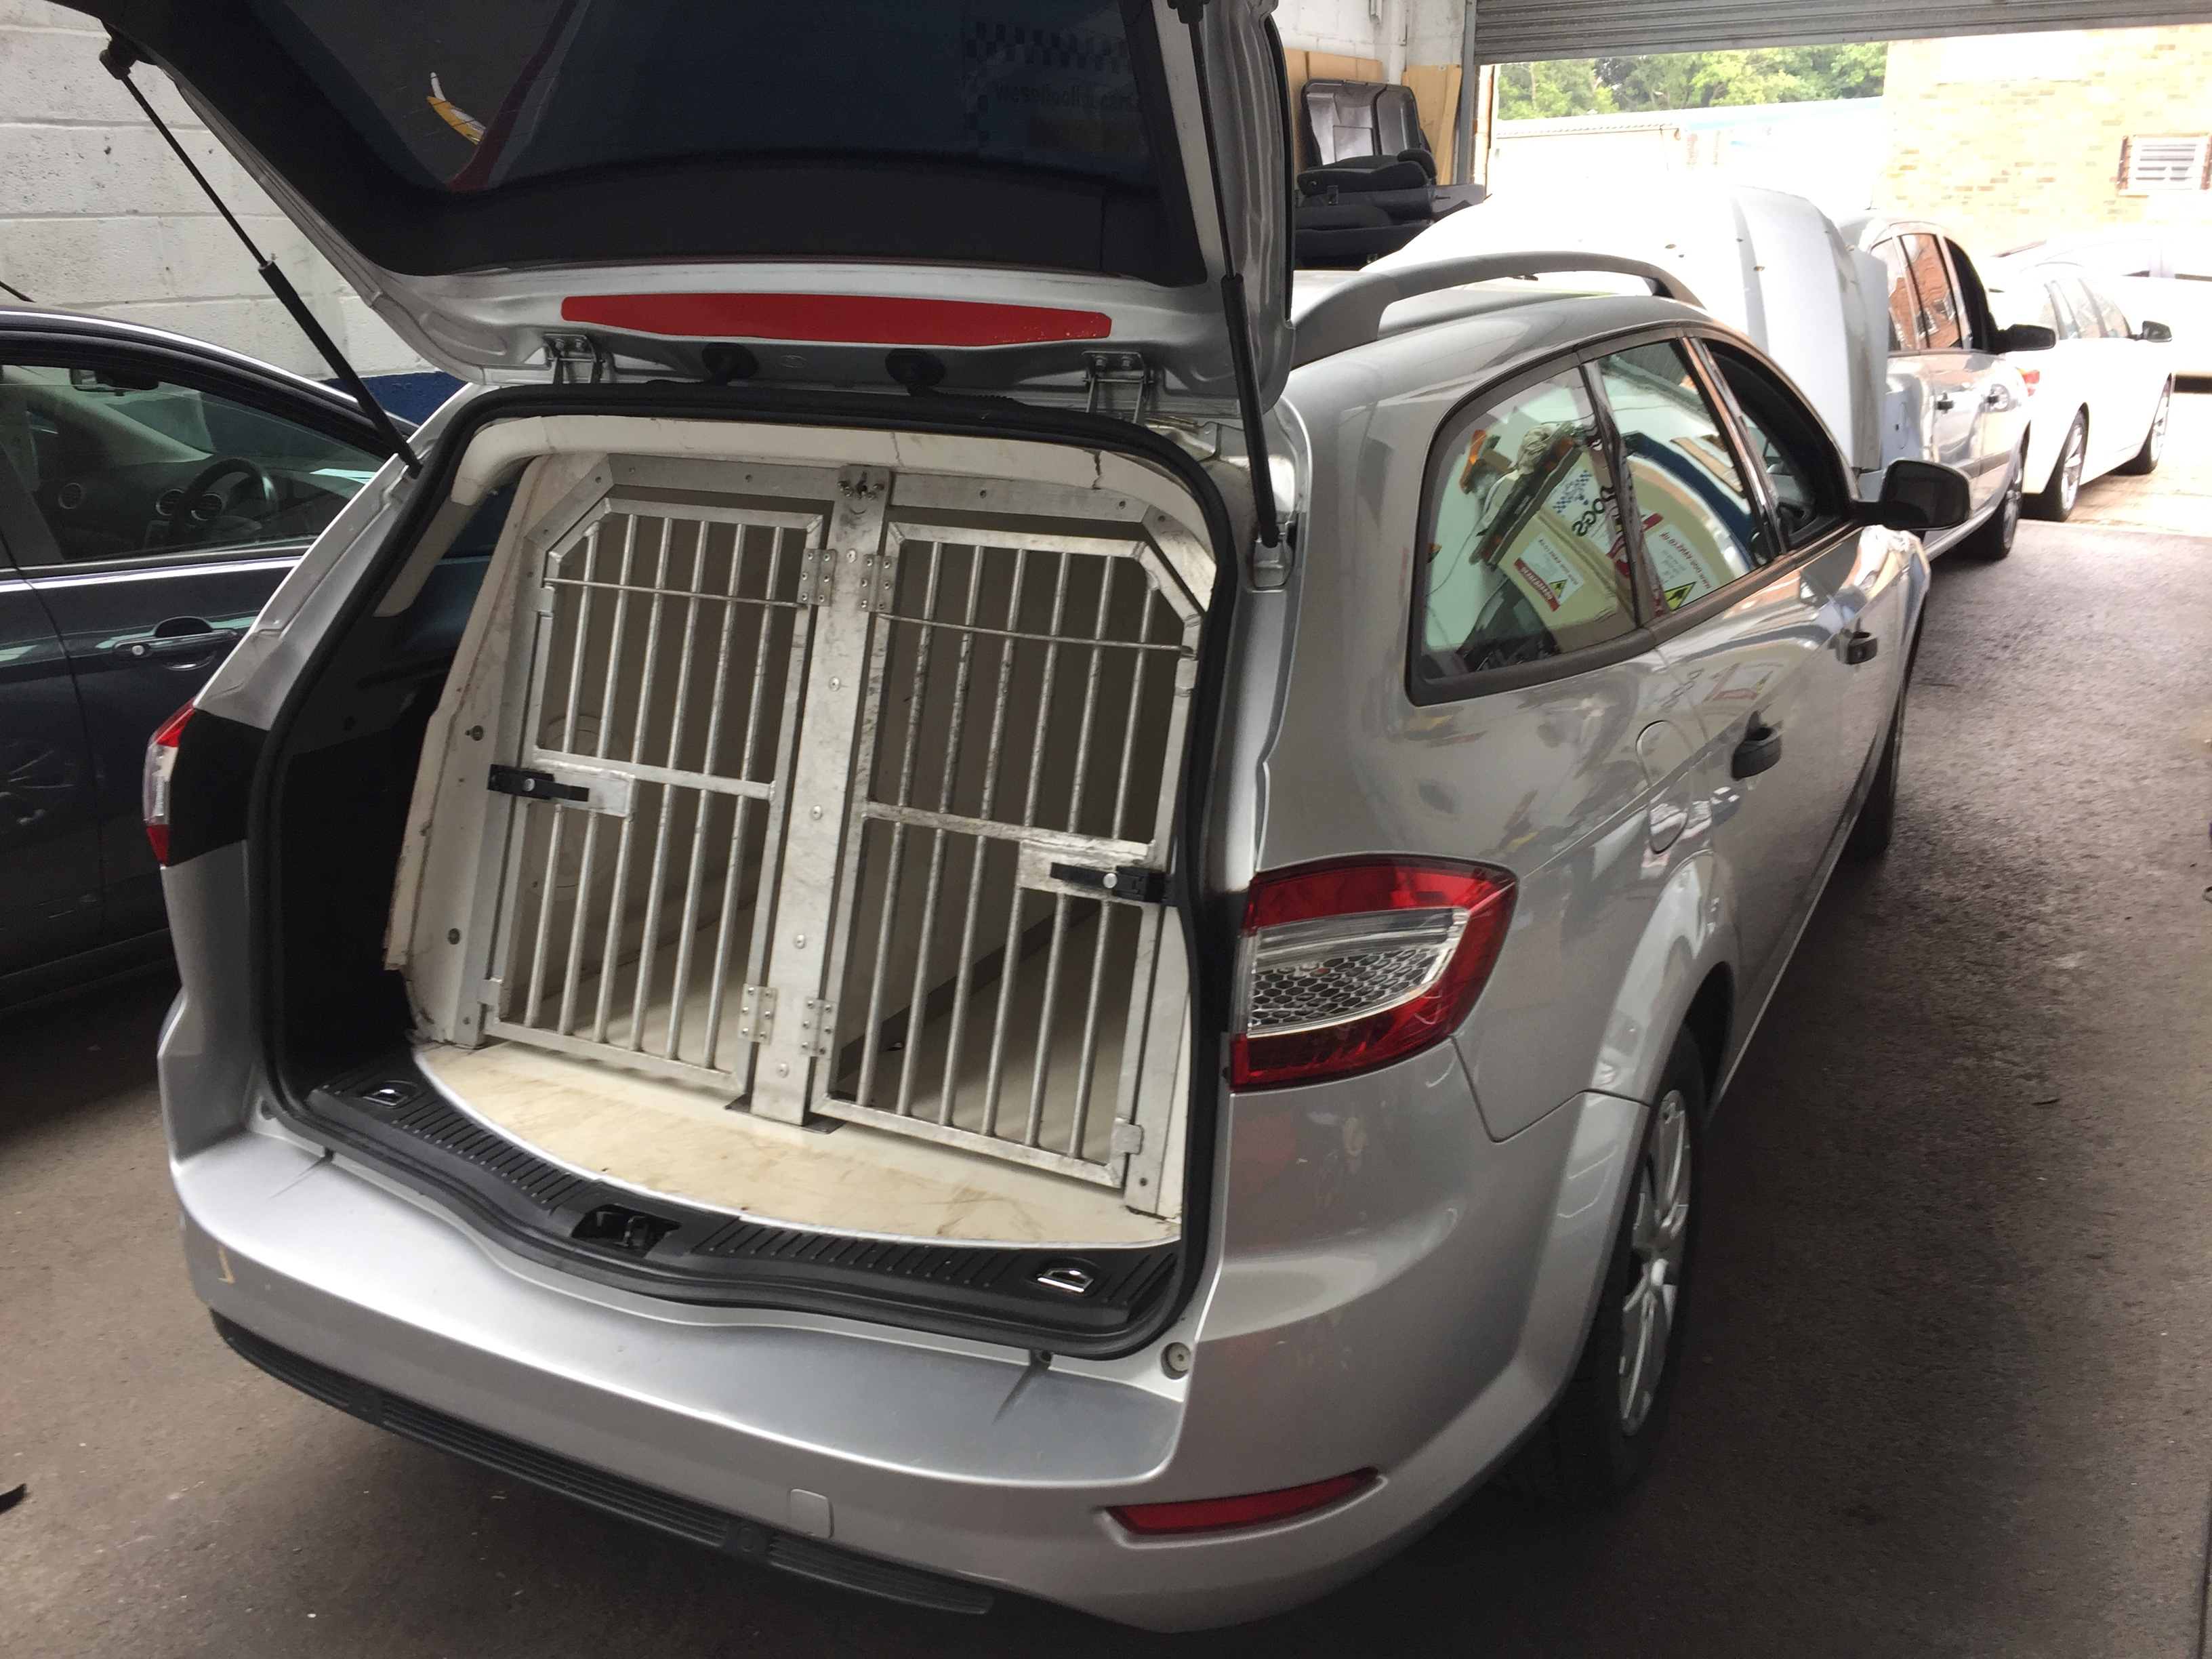 K9-Cars | Ex-Police Vehicle Sales